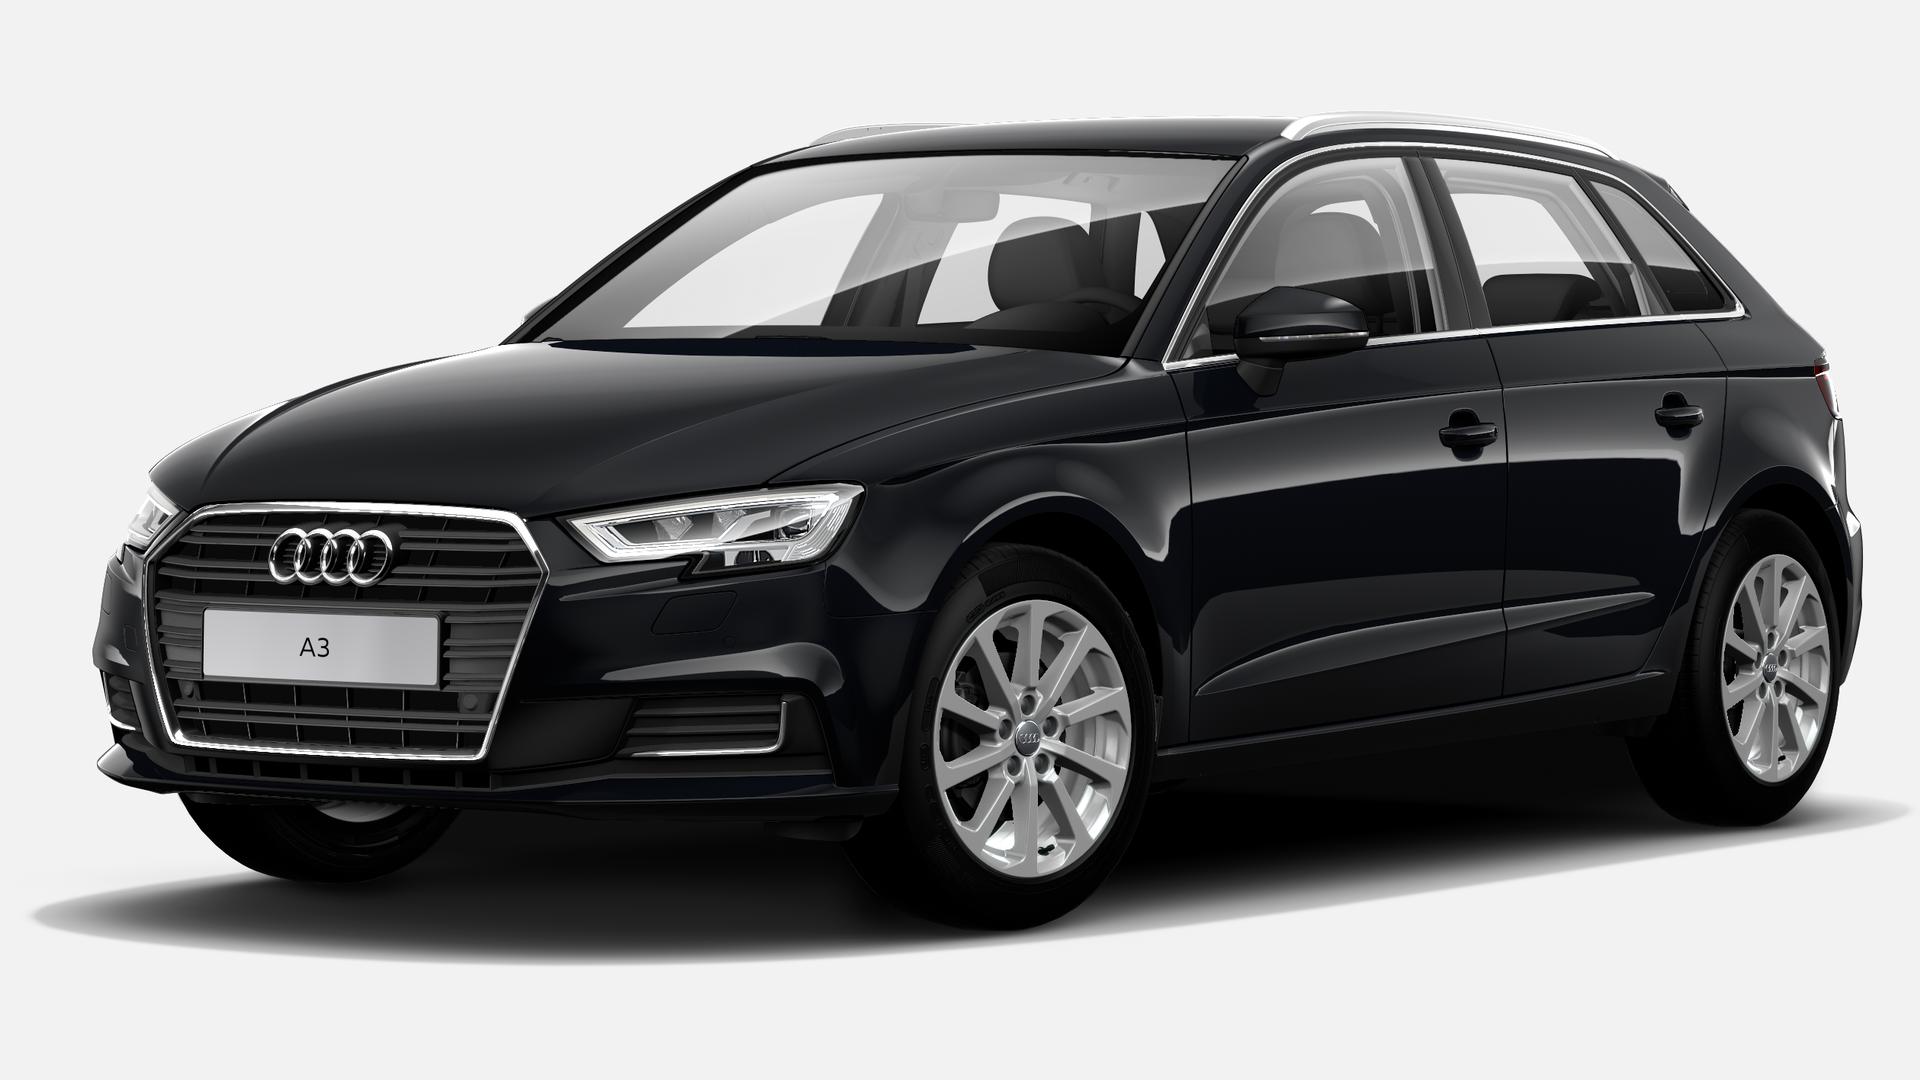 Audi A3 Sportback 30 TDI Design S-tronic  85 kW (116 CV)  nuevo en Lugo